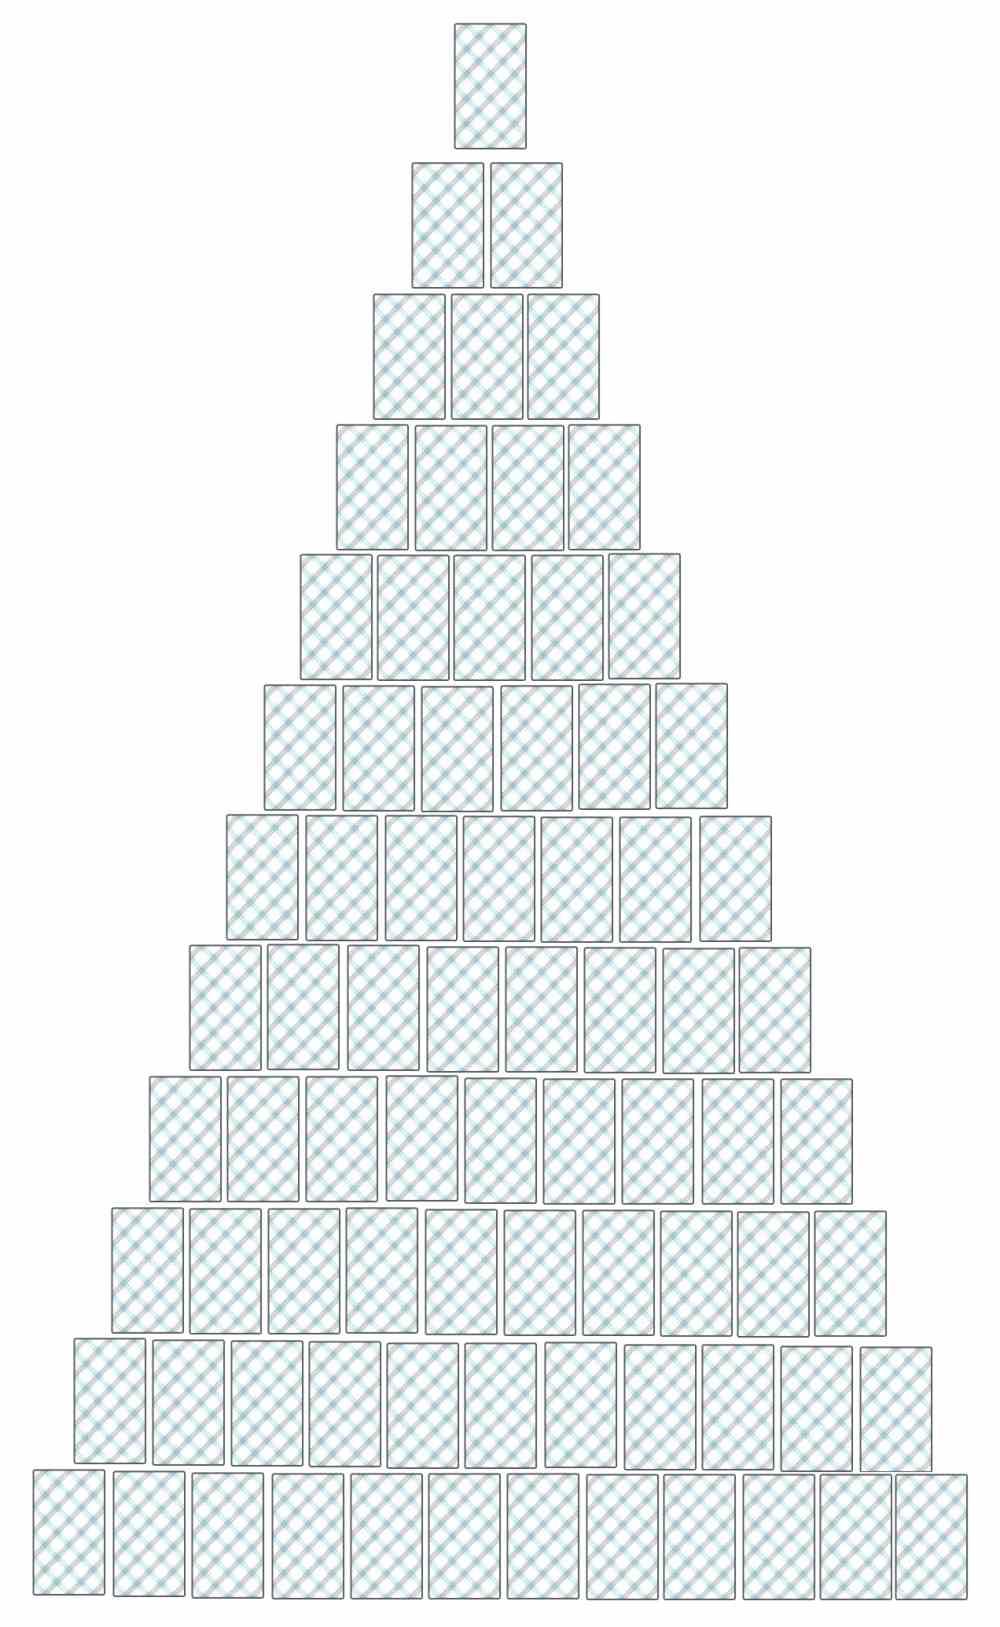 Full Pyramid Tarot Reading Spread